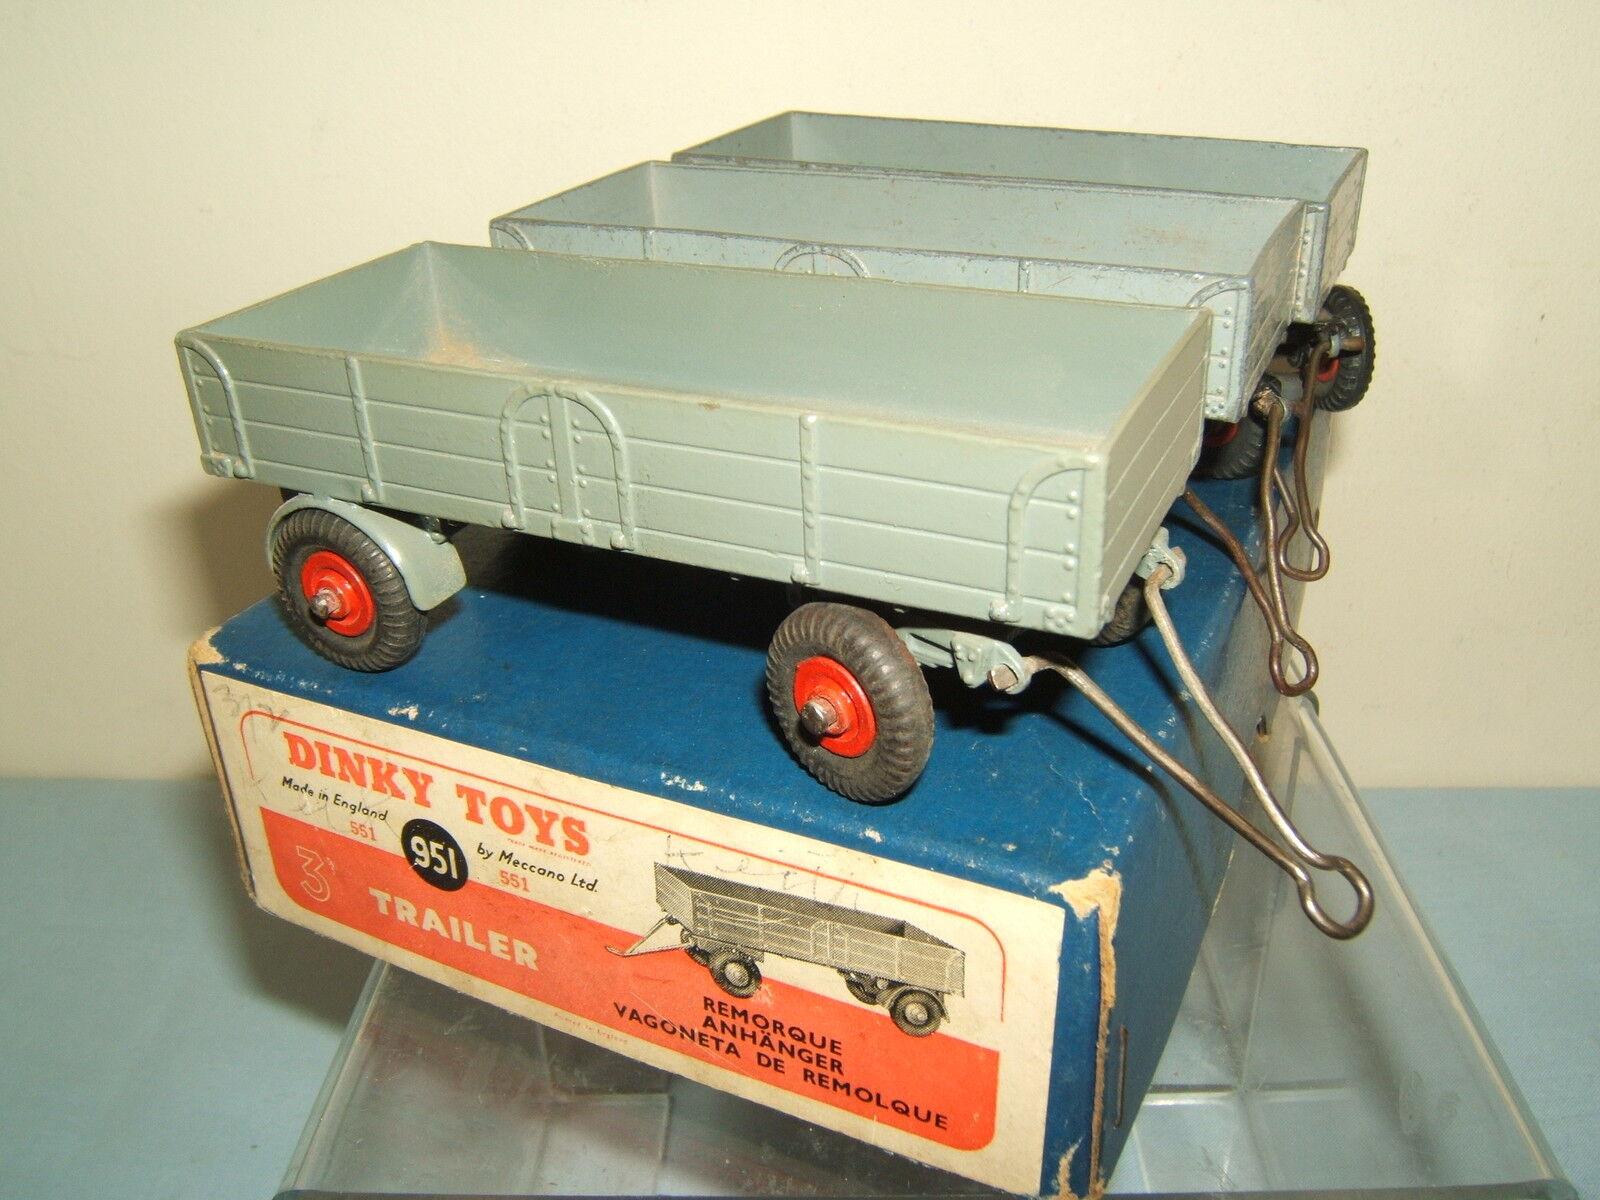 DINKY TOYS No.951 551  3 X  TRAILER  ( TRADE BOX)   VN MIB